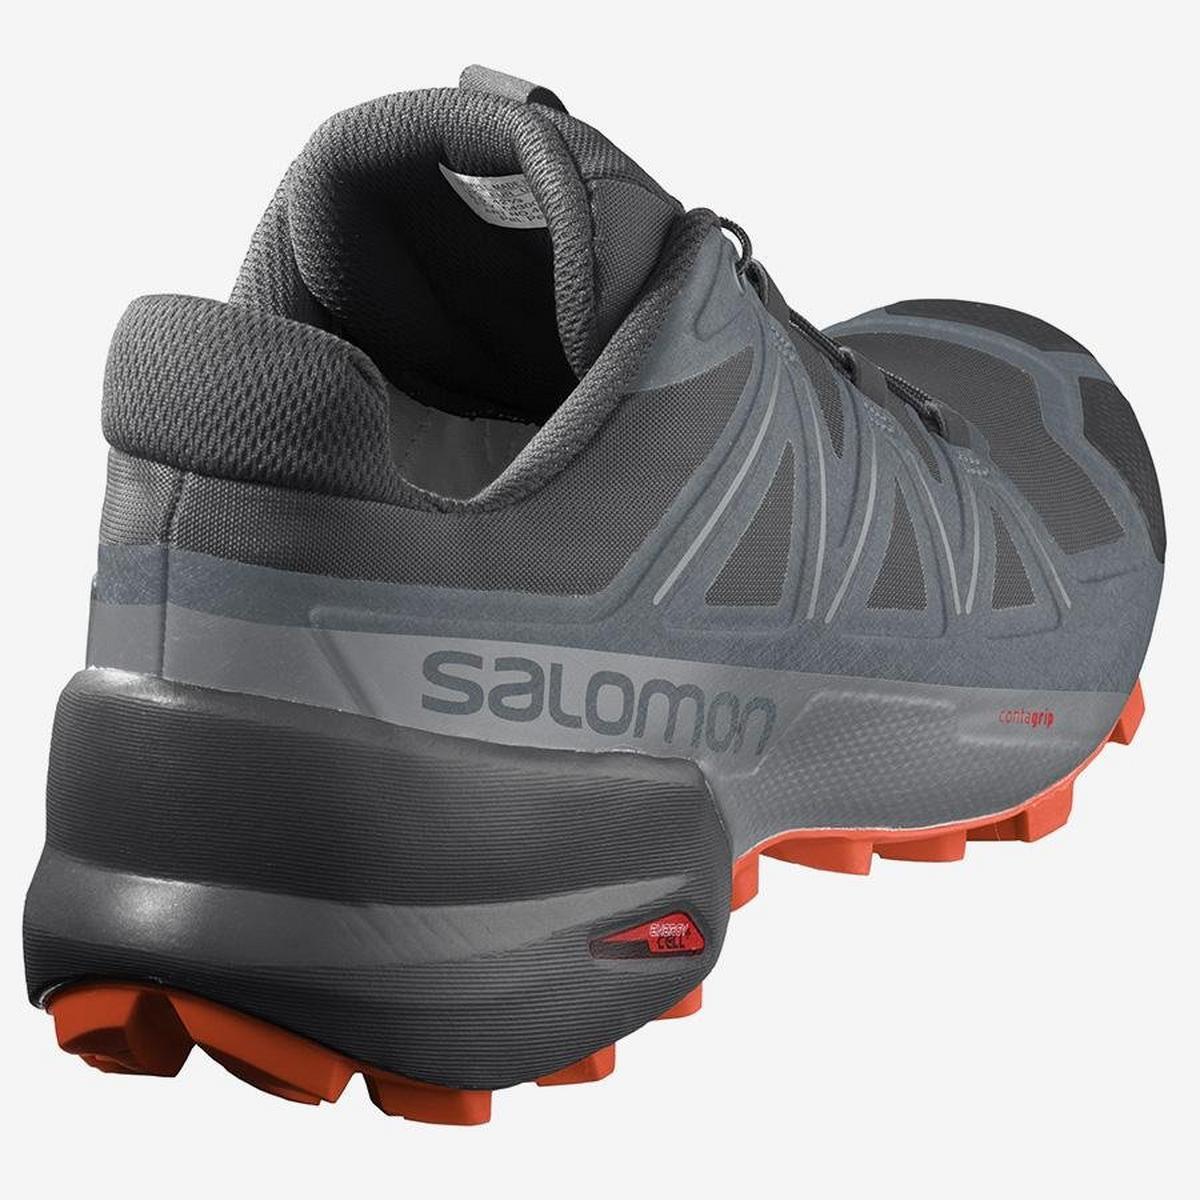 Salomon Men's Salomon Speedcross 5 - Black